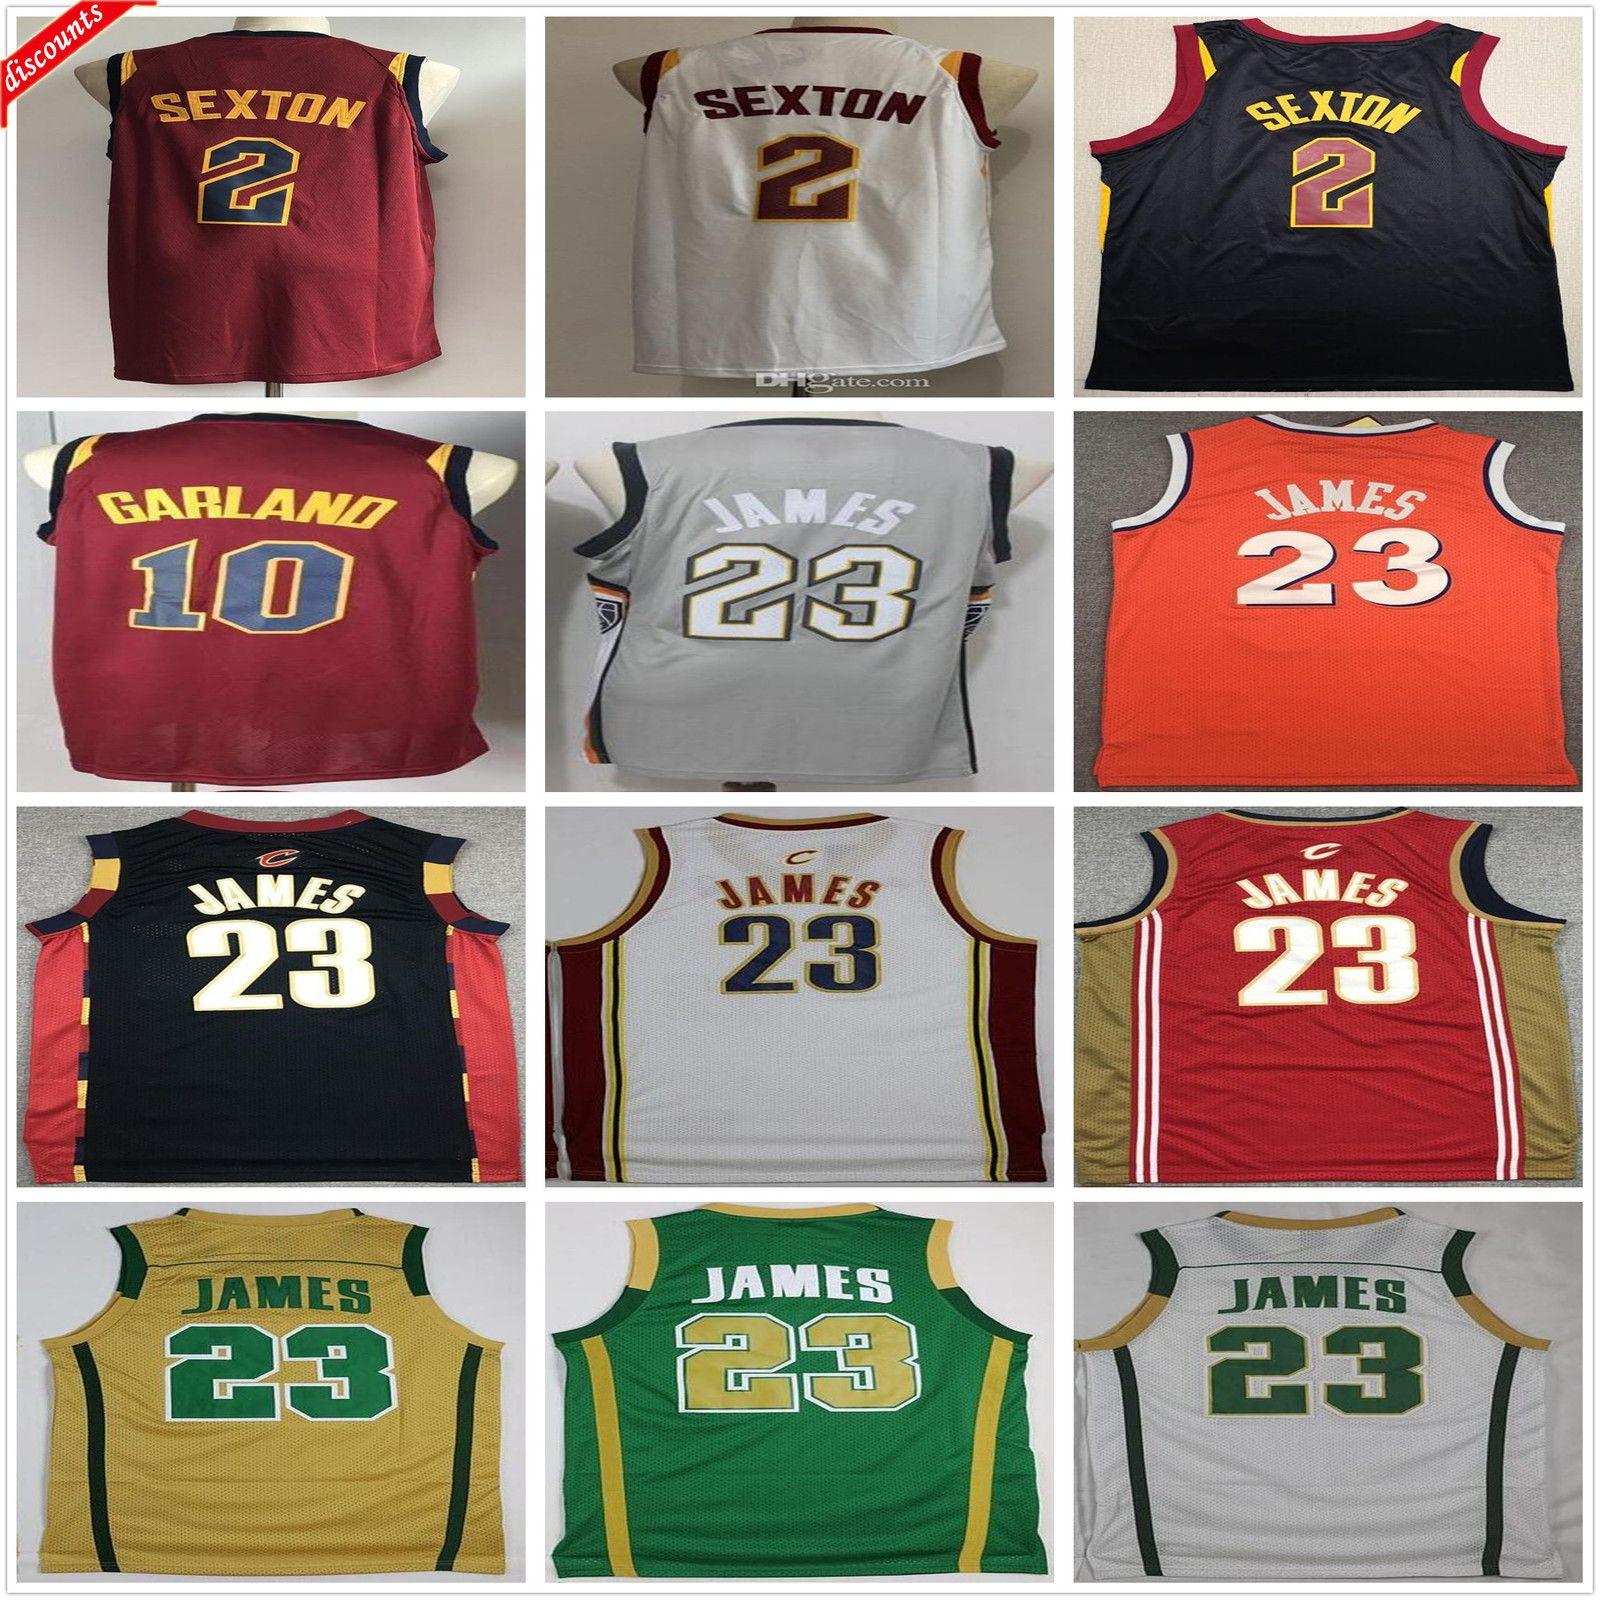 Retro 2003 2004 Vintage Classic LeBron # 23 James Jersey Kampf Irish Rot Schwarz Weiß Collin 2 Sexton Darius 10 Girlande Basketballtrikots